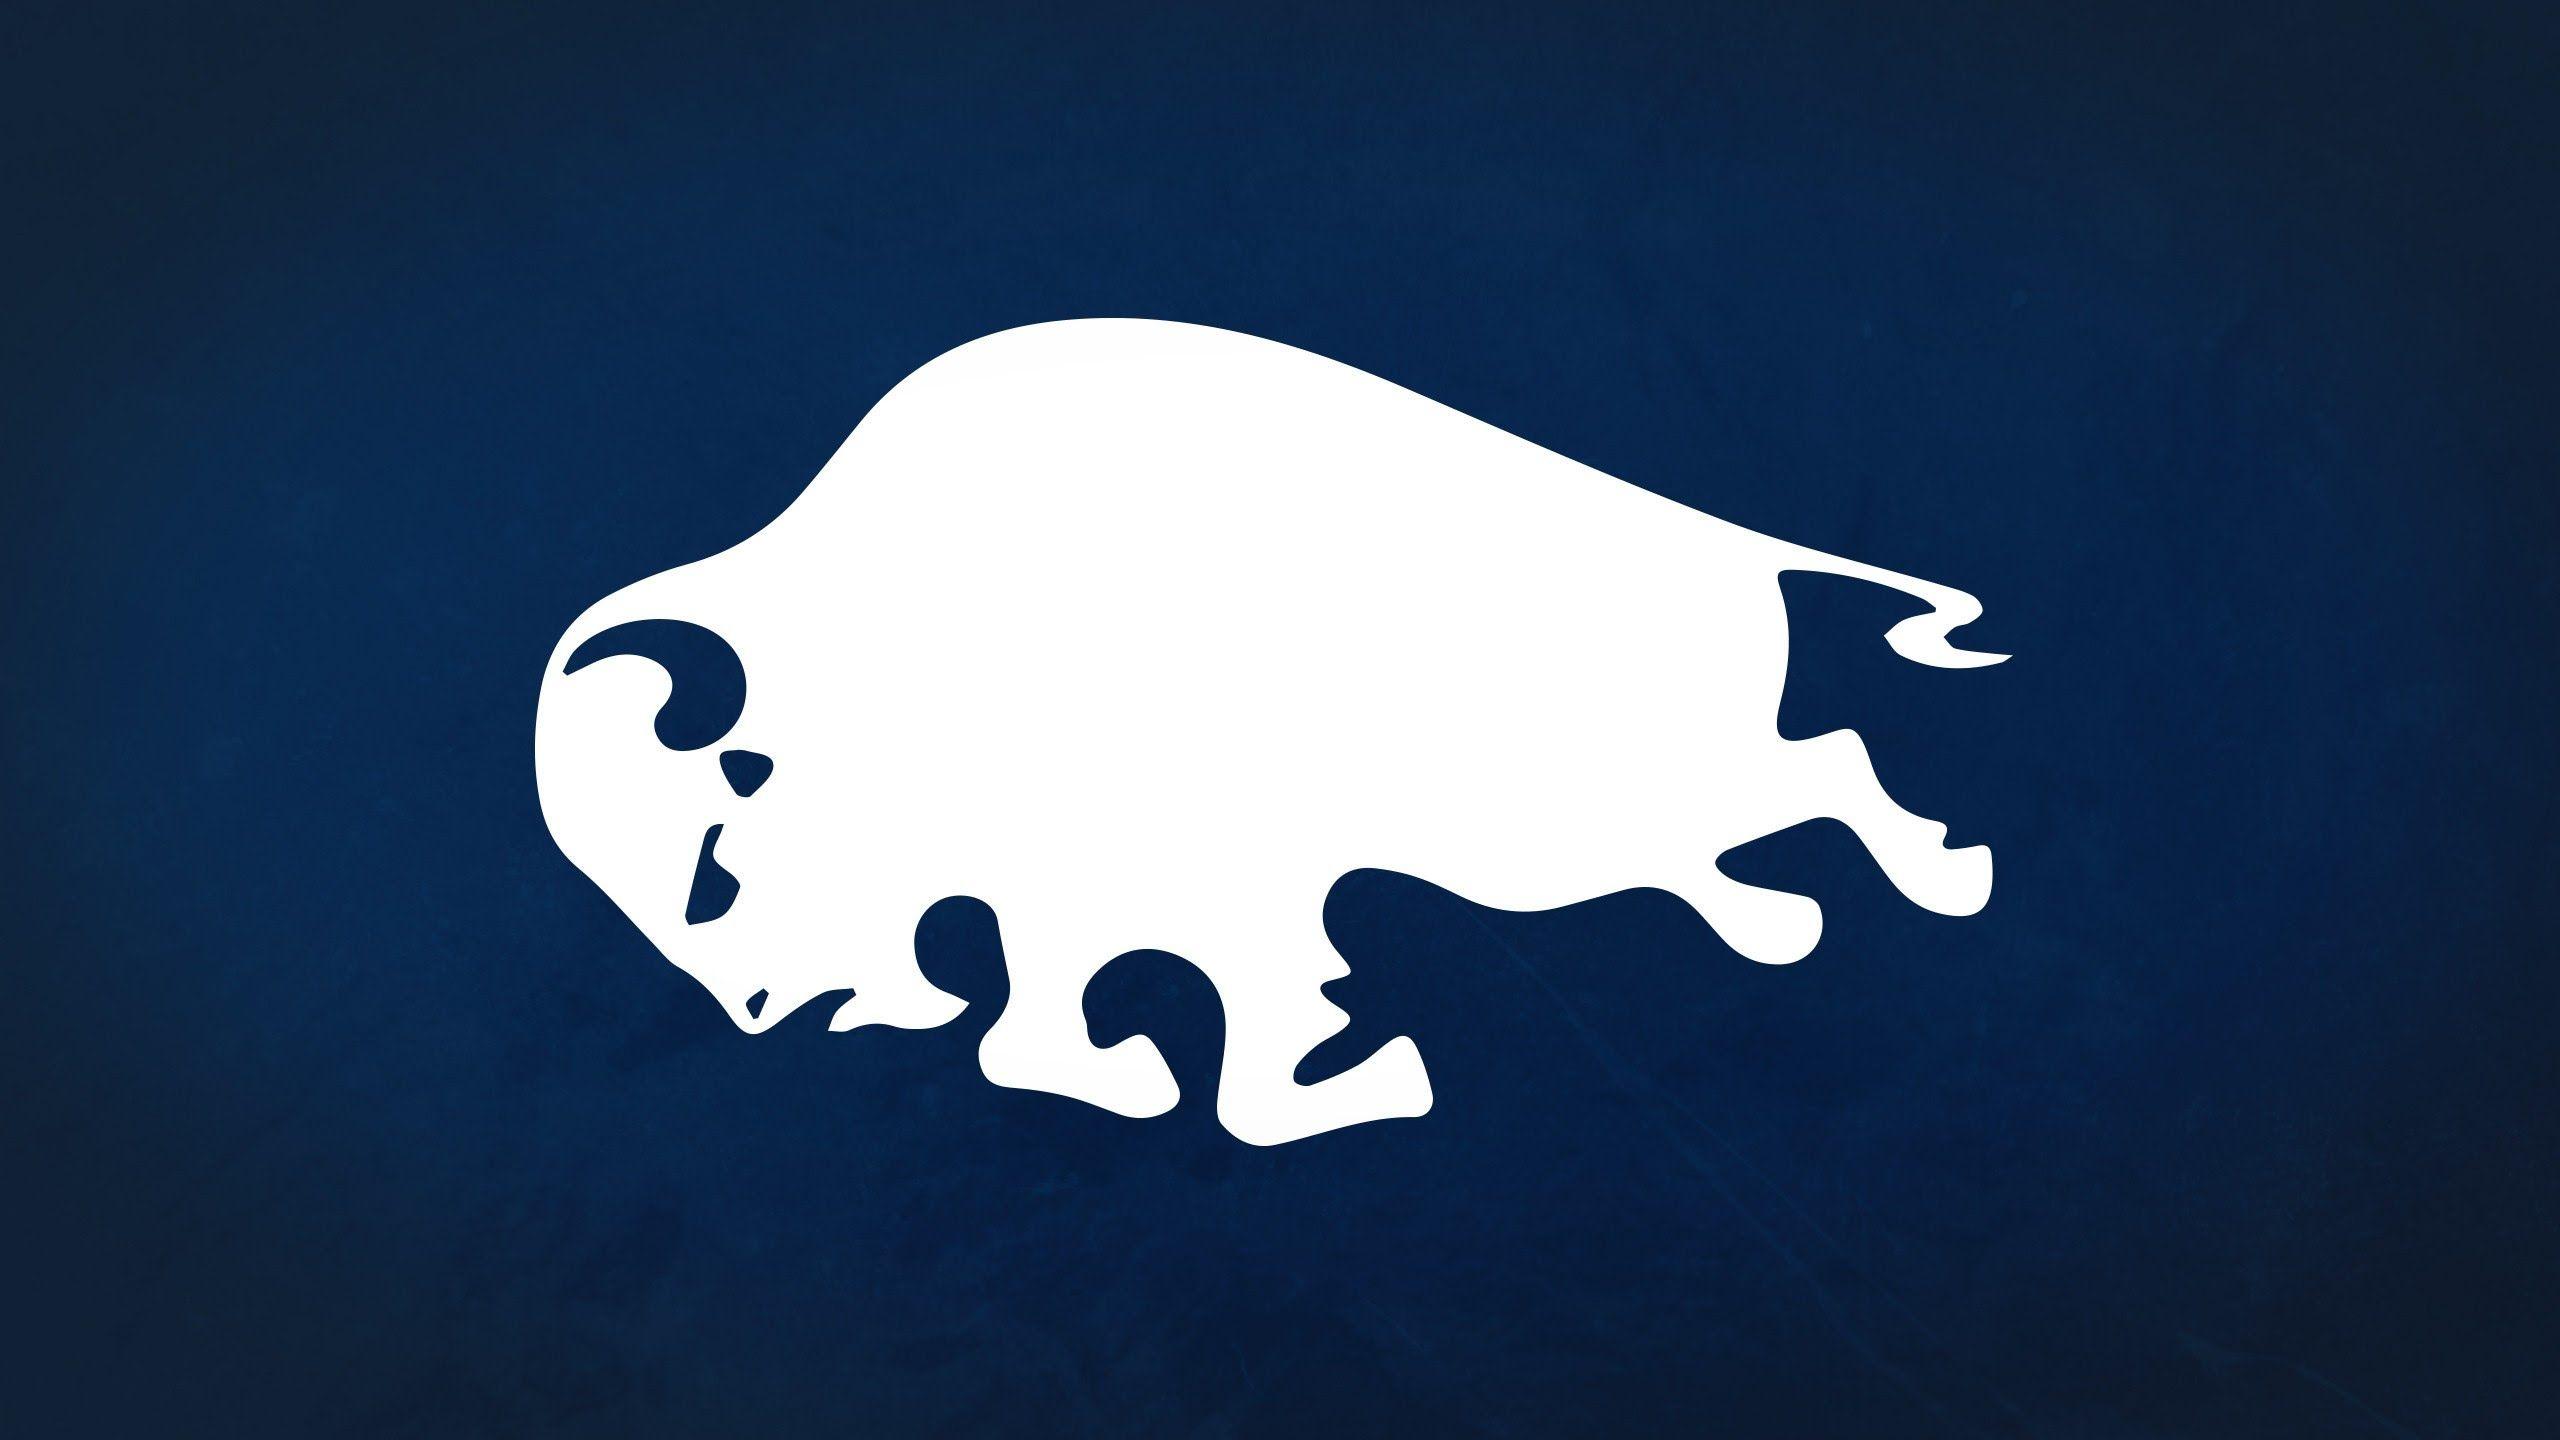 Buffalo Sabres 2015 16 Season Pump Up Hd Buffalo Sabres Free Desktop Wallpaper Buffalo Sabres Hockey